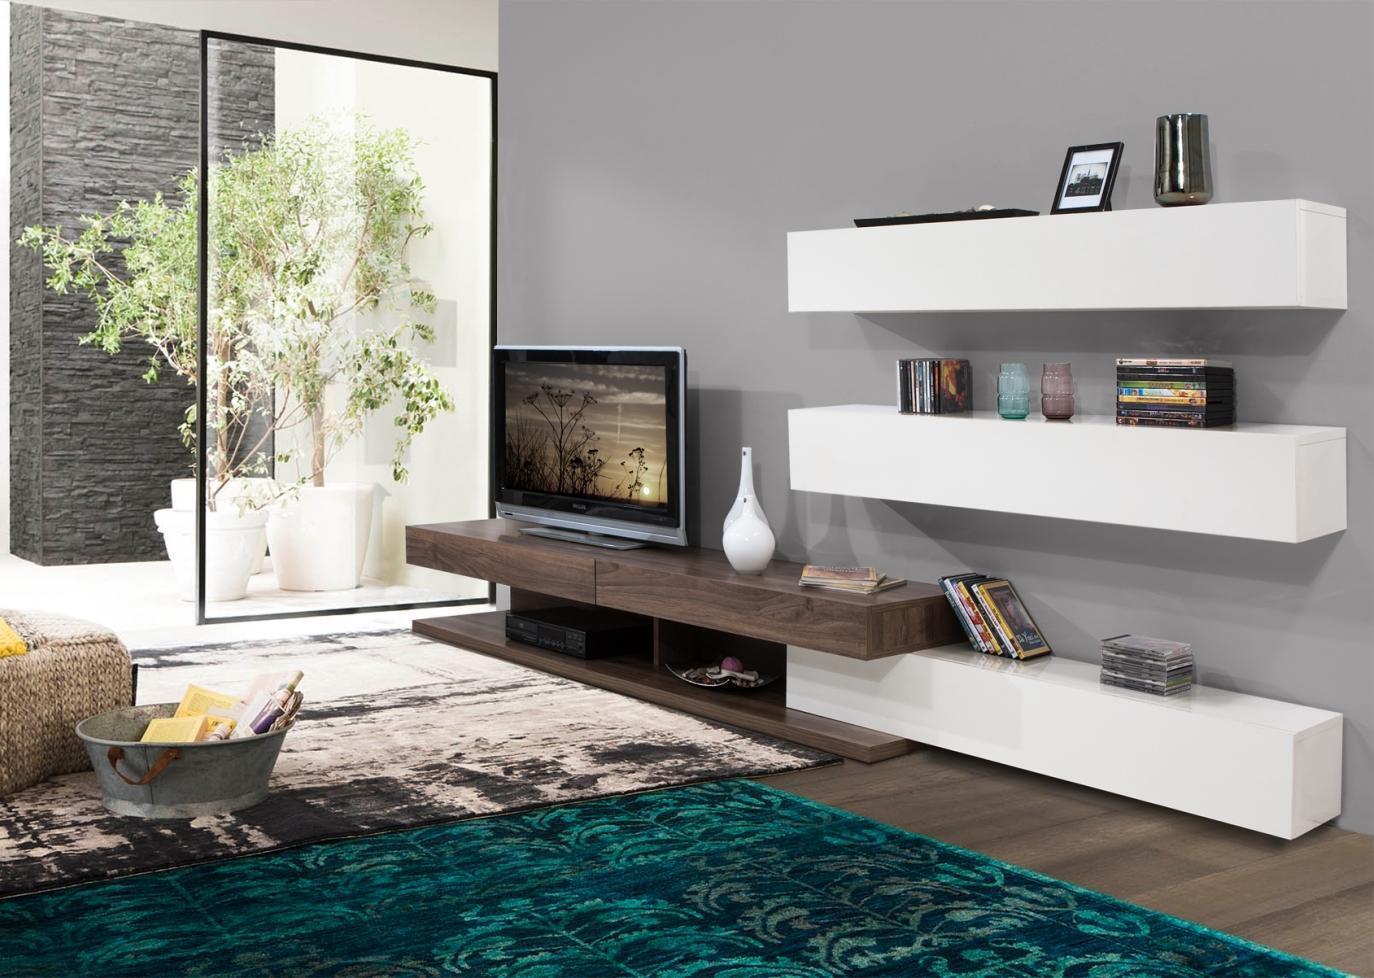 Modern yeni tv unite modelleri 7 - Yeni 2015 Modern Tv Uniteleri